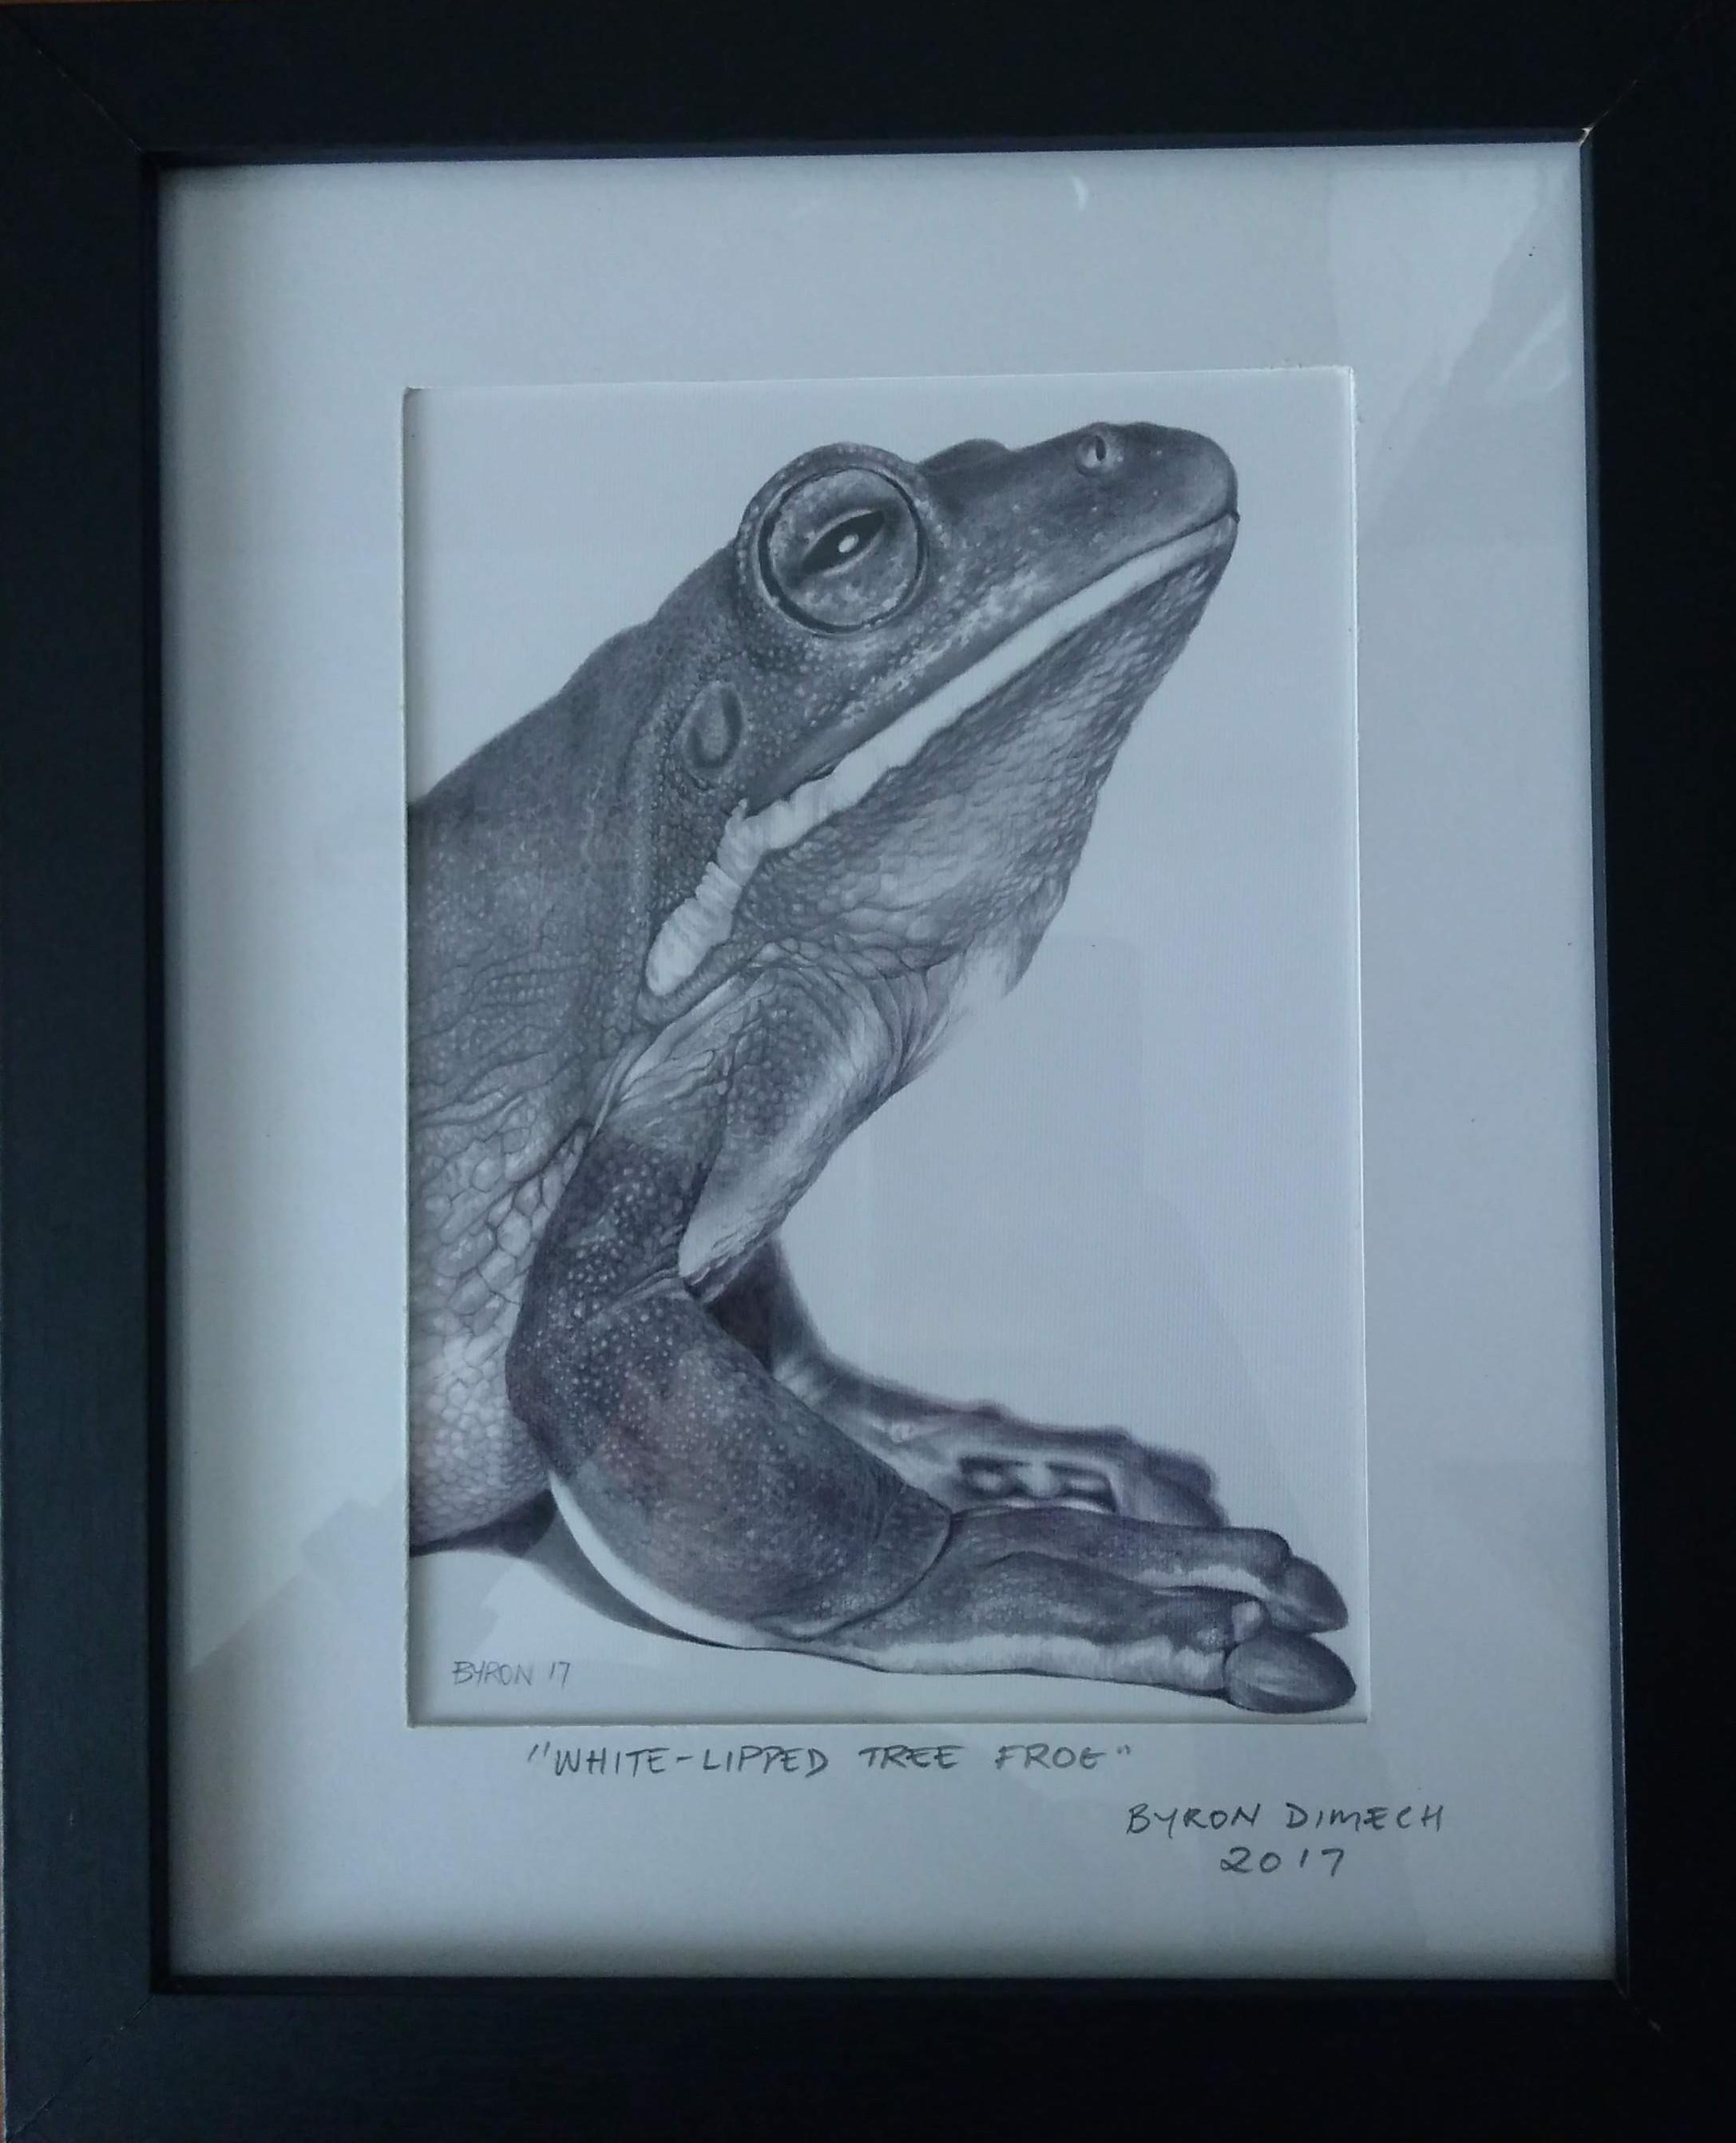 40_Byron_Dimech__White-lipped_Tree_Frog.jpg